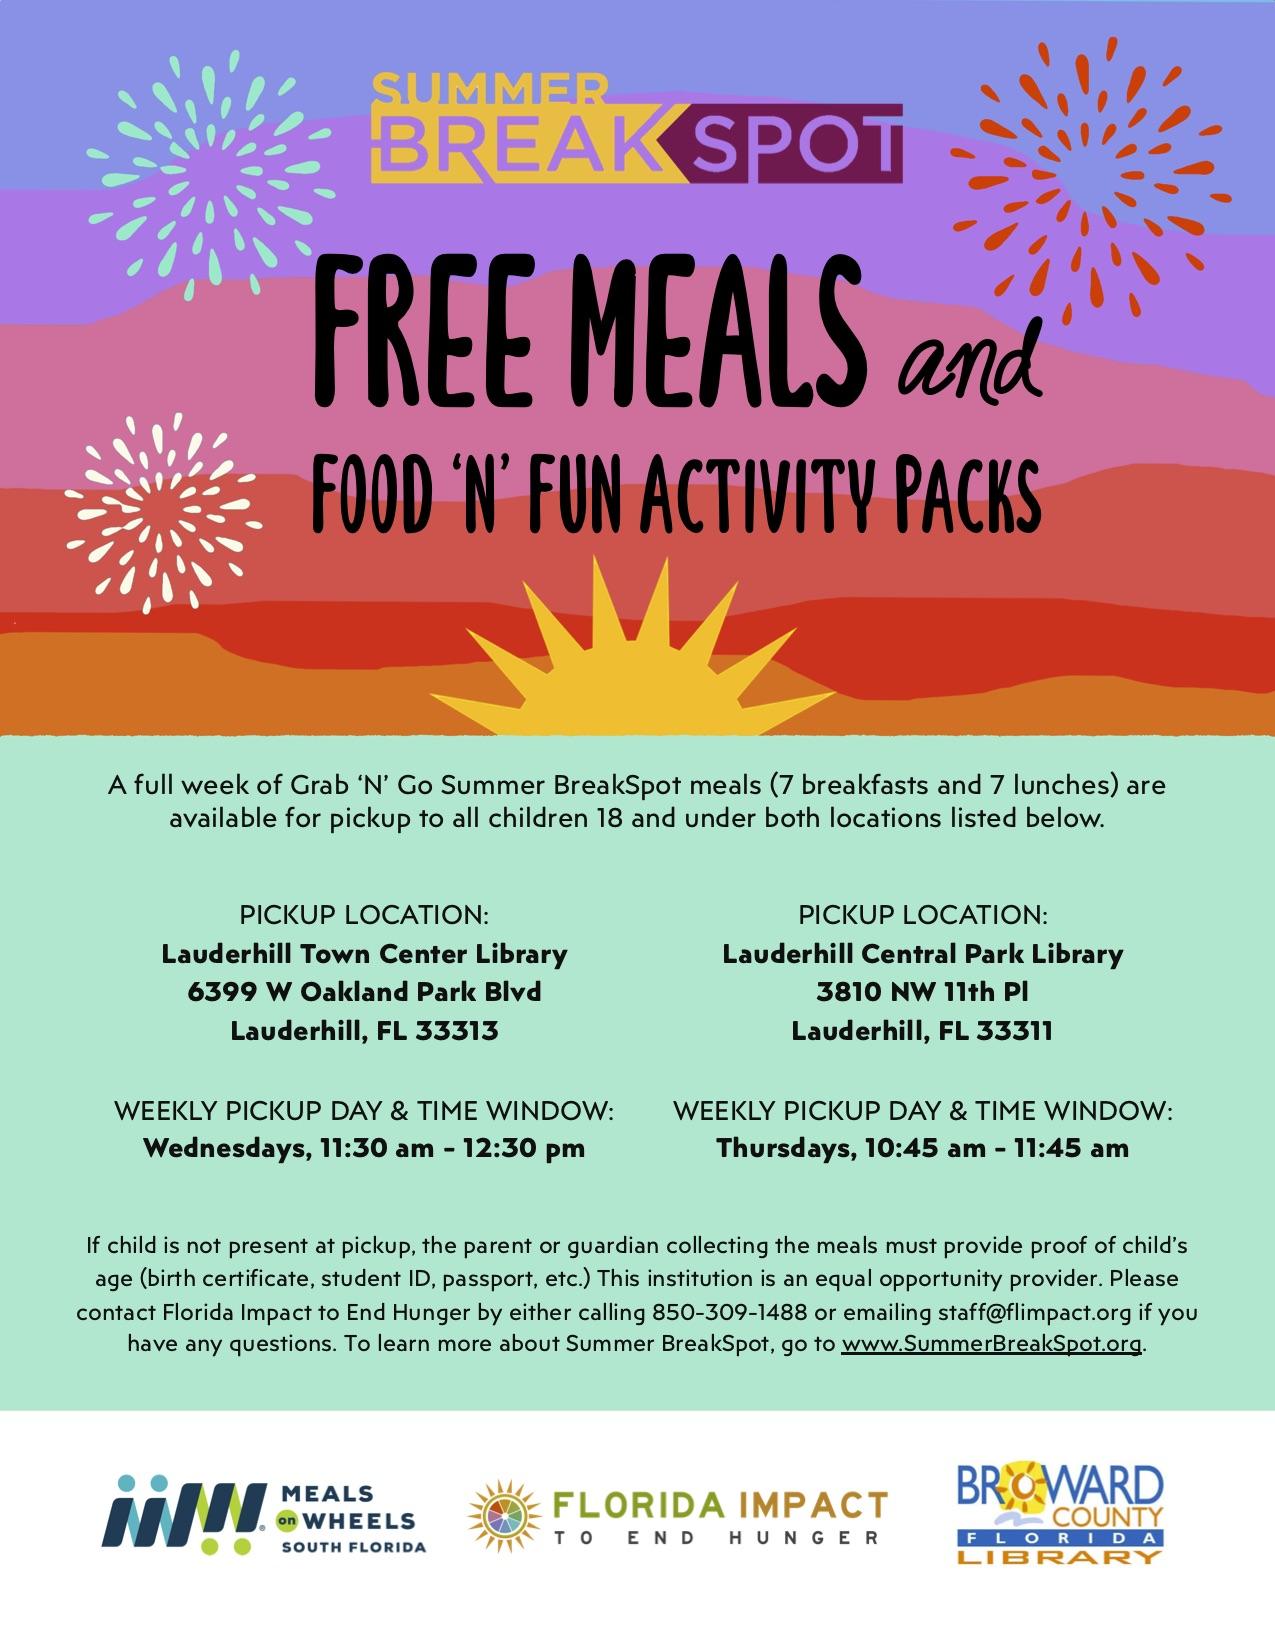 2020 Summer Break Spot - Food N Fun Poster Flyer - Lauderhill Town Center and Central Park Libraries